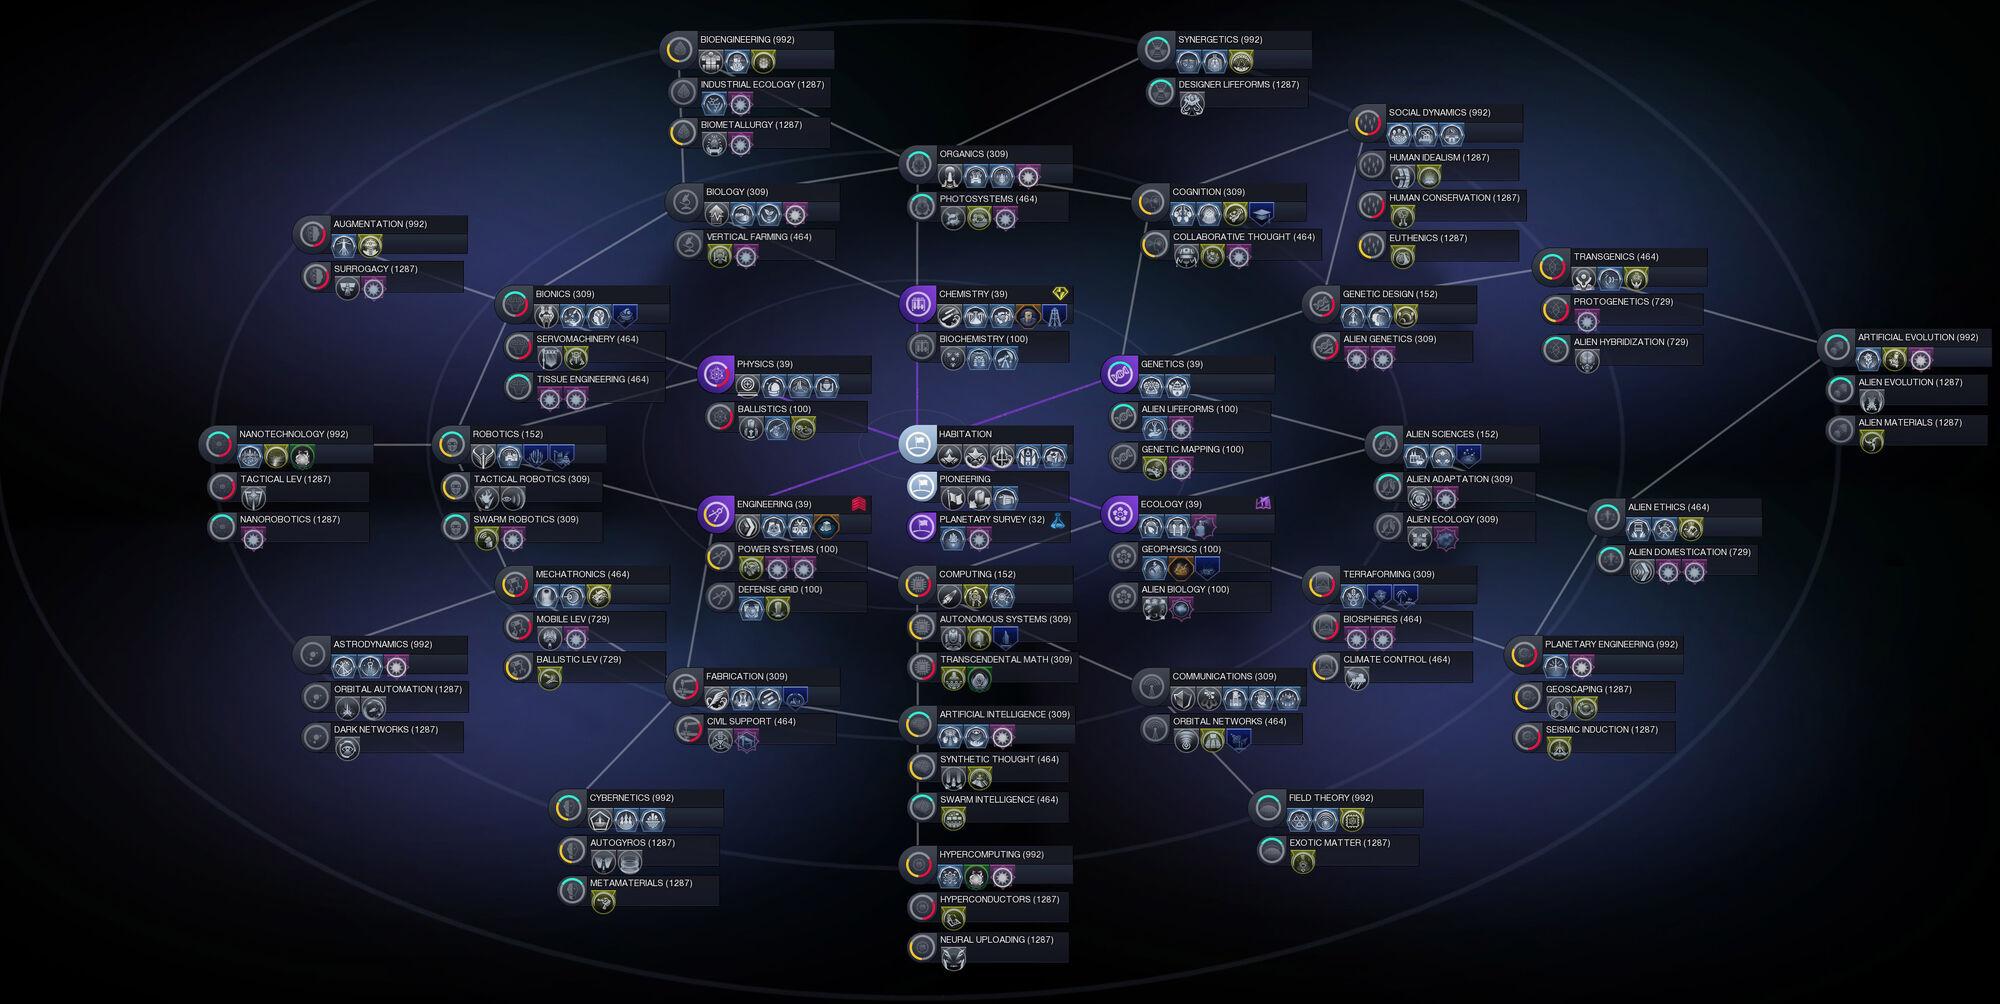 Civ 5 tech tree guide